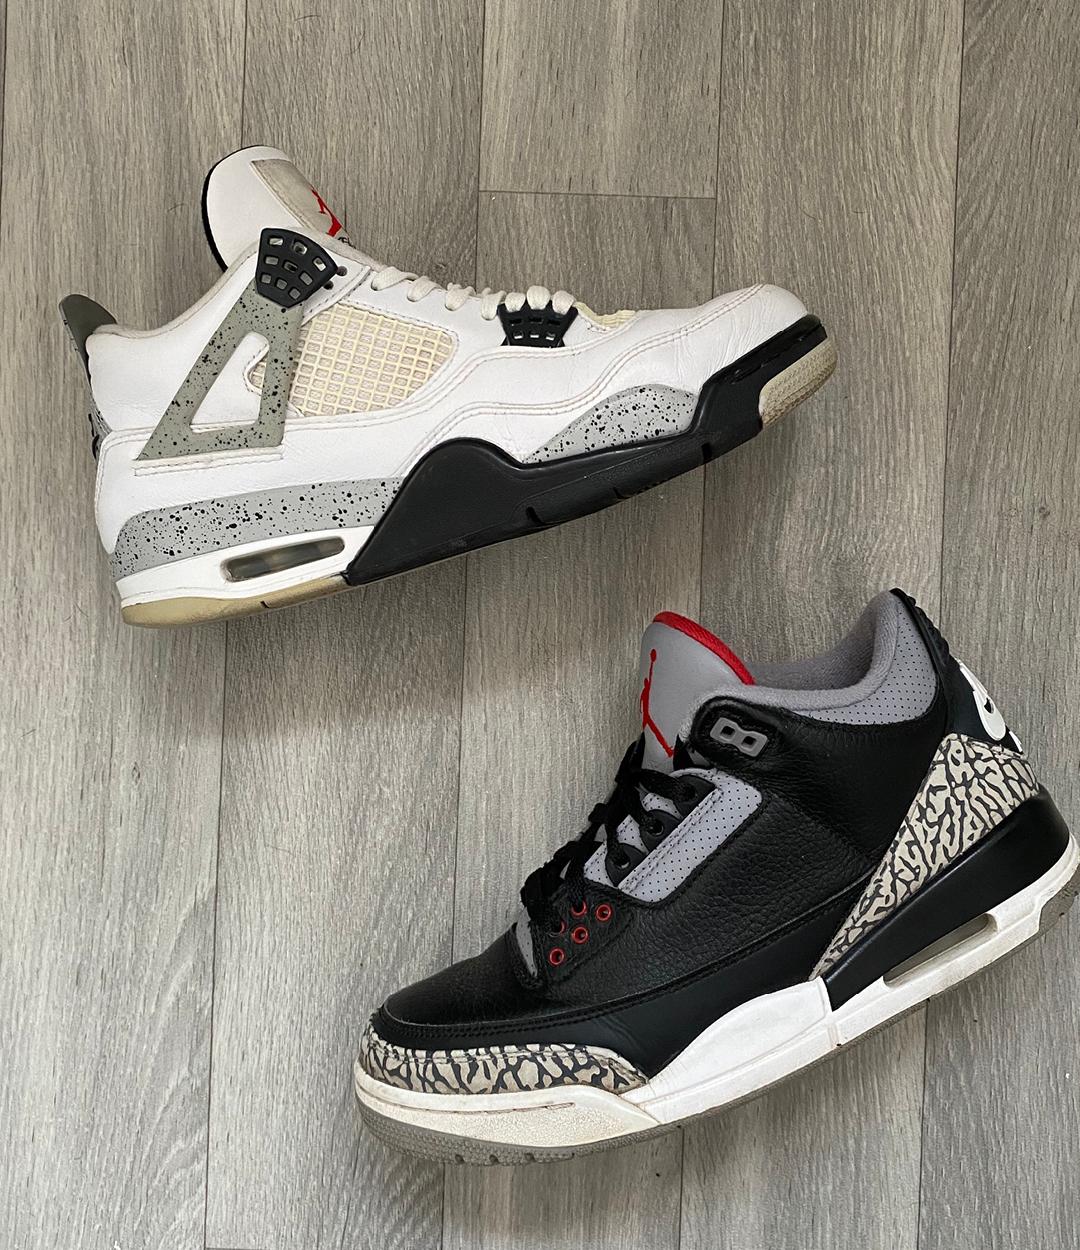 Air Jordan 4 and Air Jordan 3